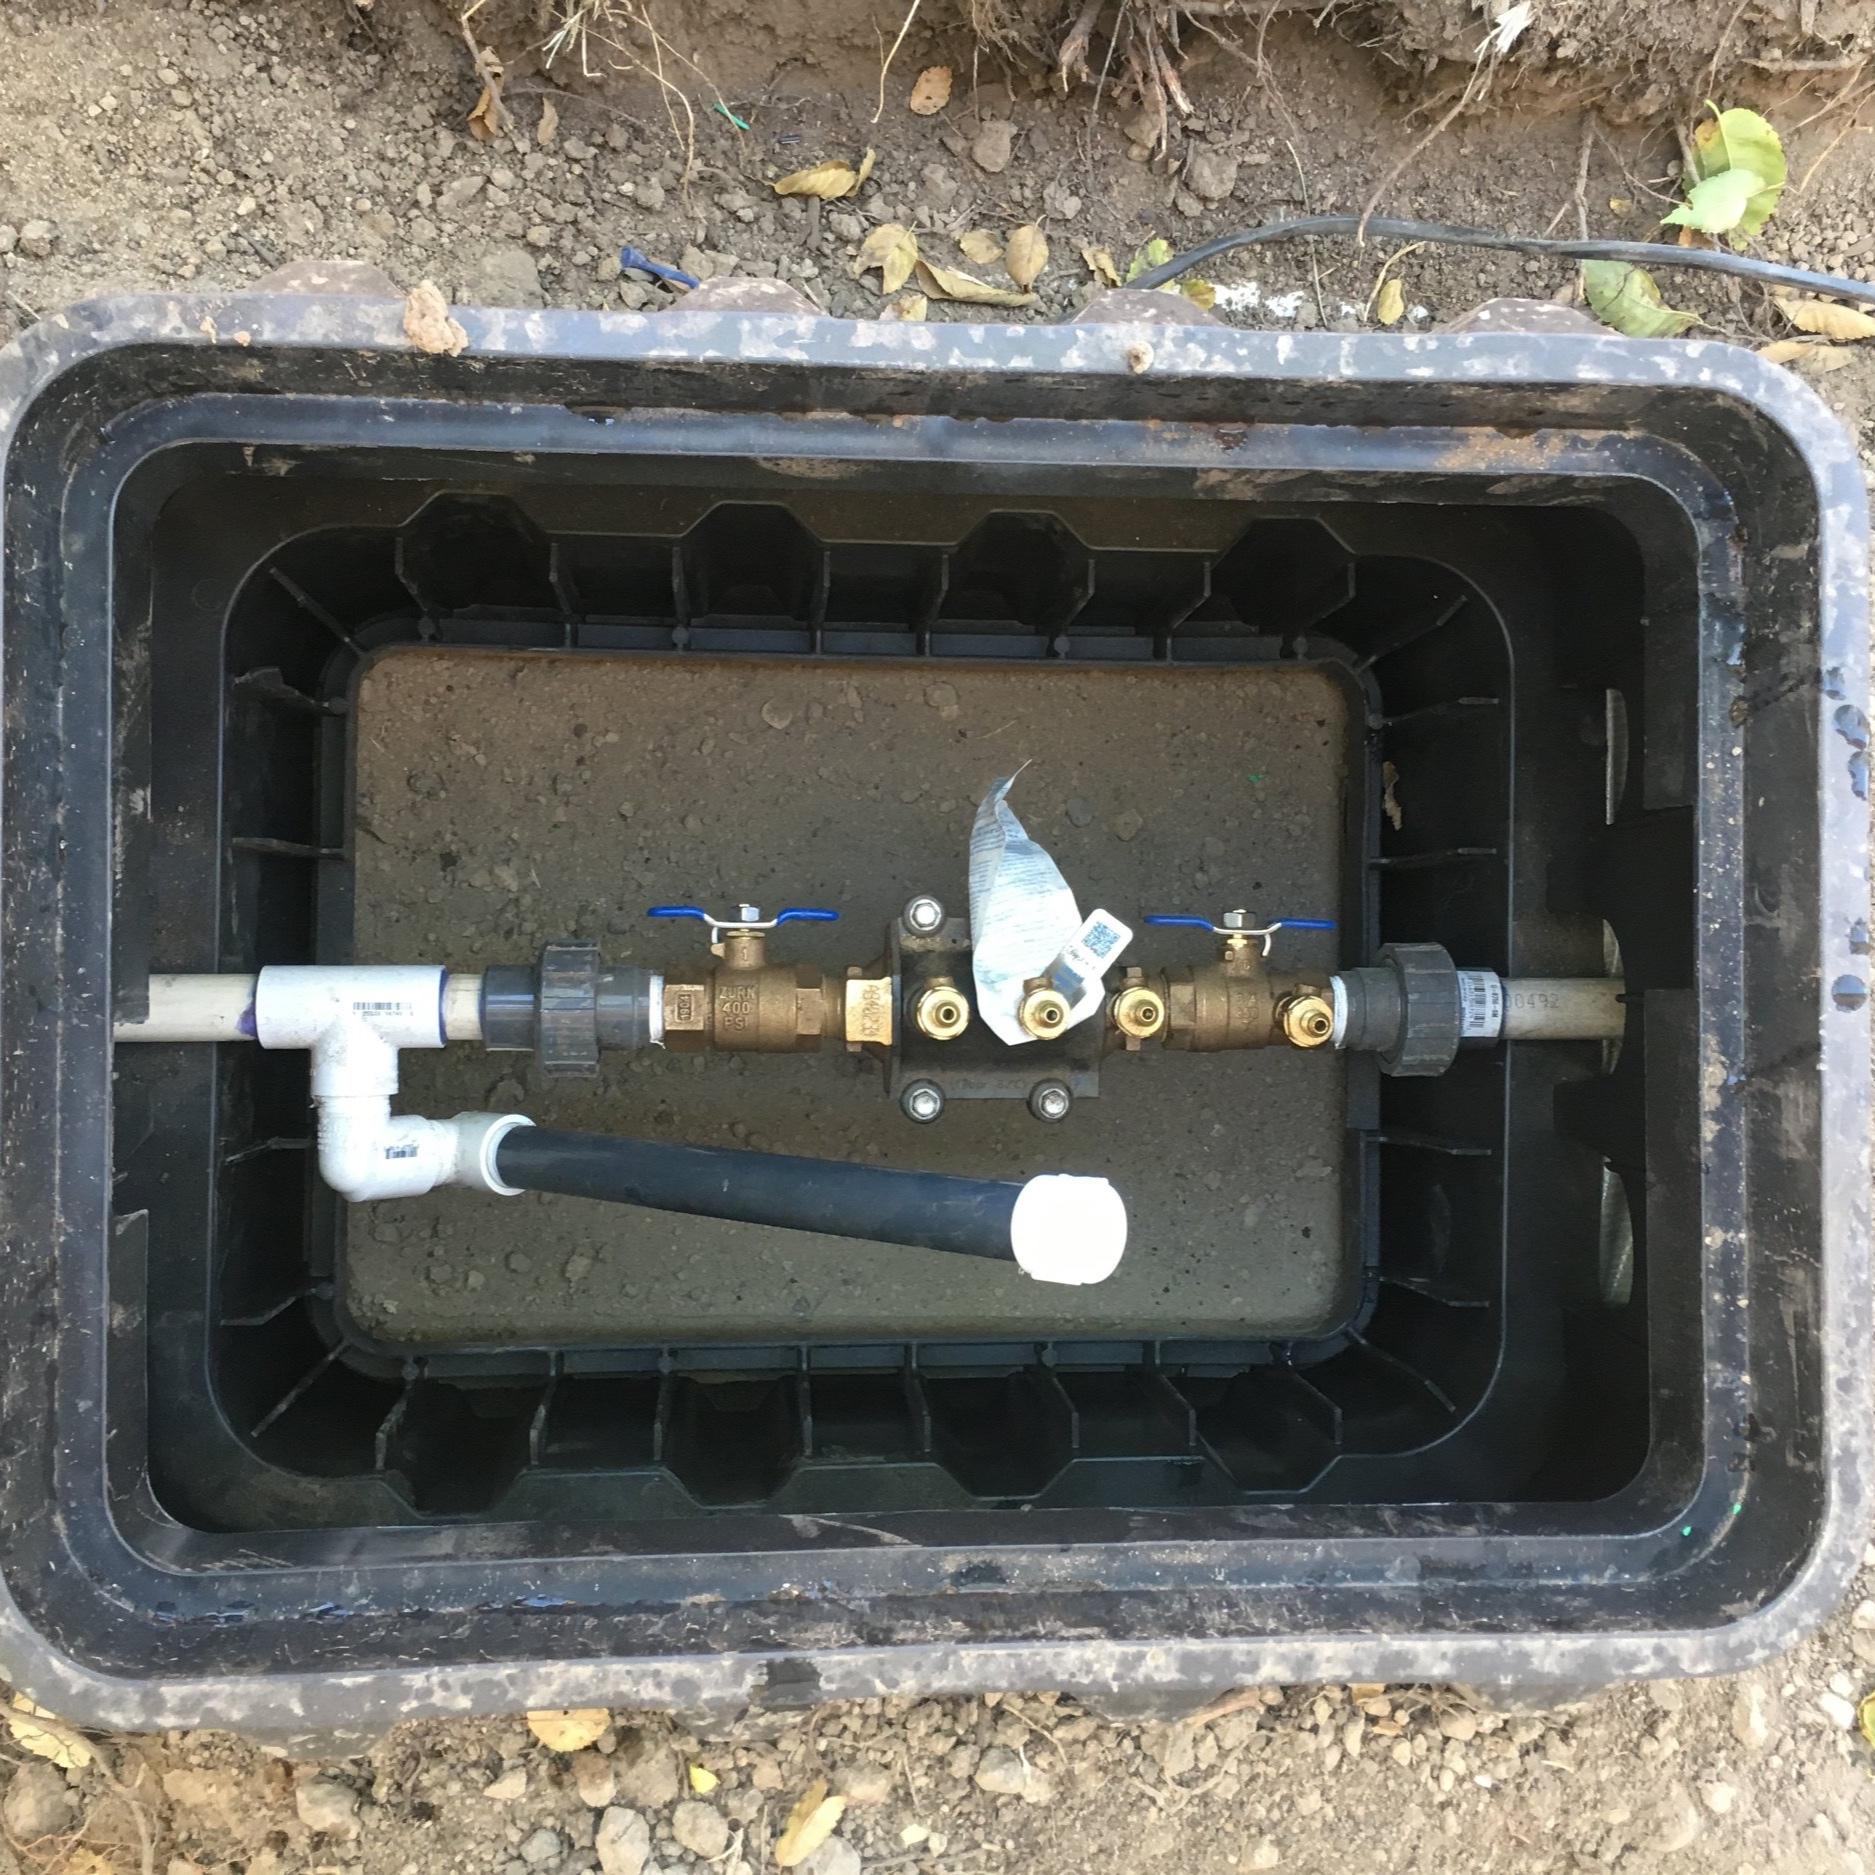 Newly installed valve box